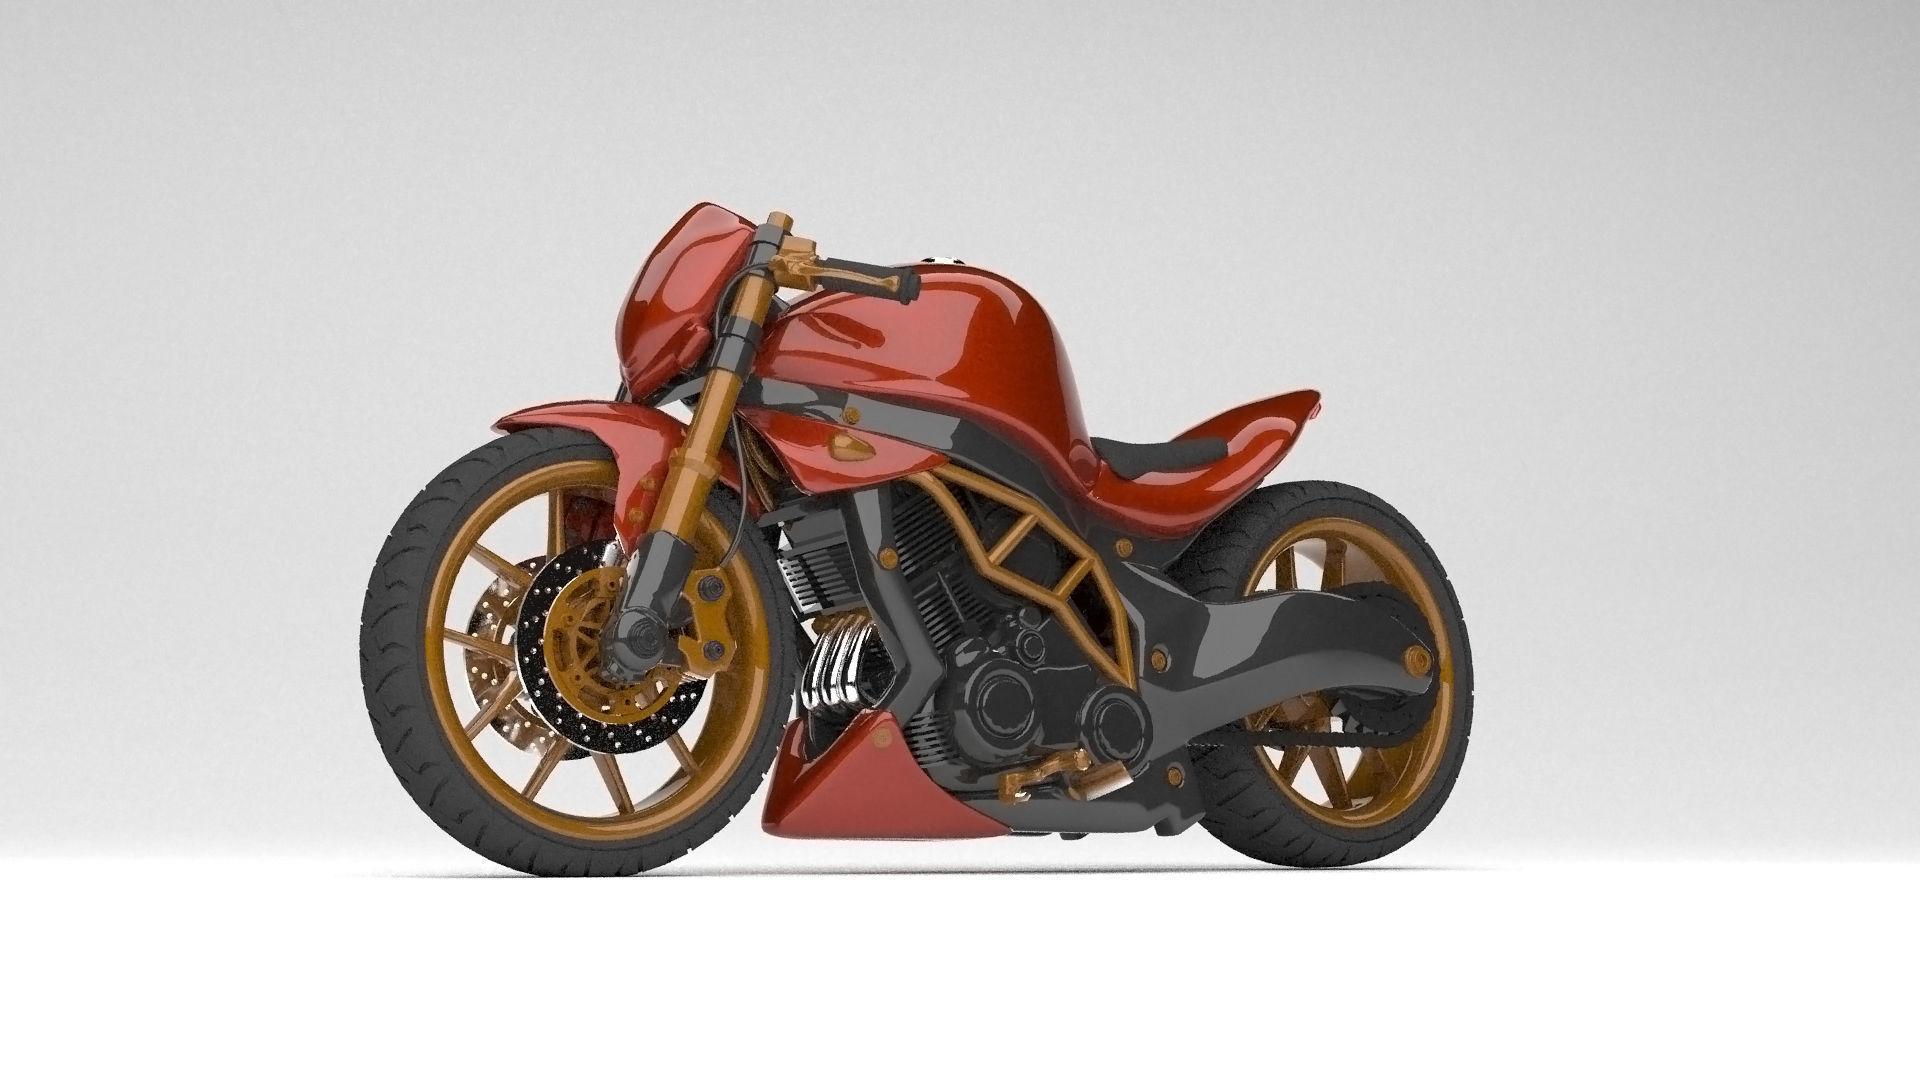 Naked Motor Bike 1000cc Modified Kawasaki modelling 3d max 2018